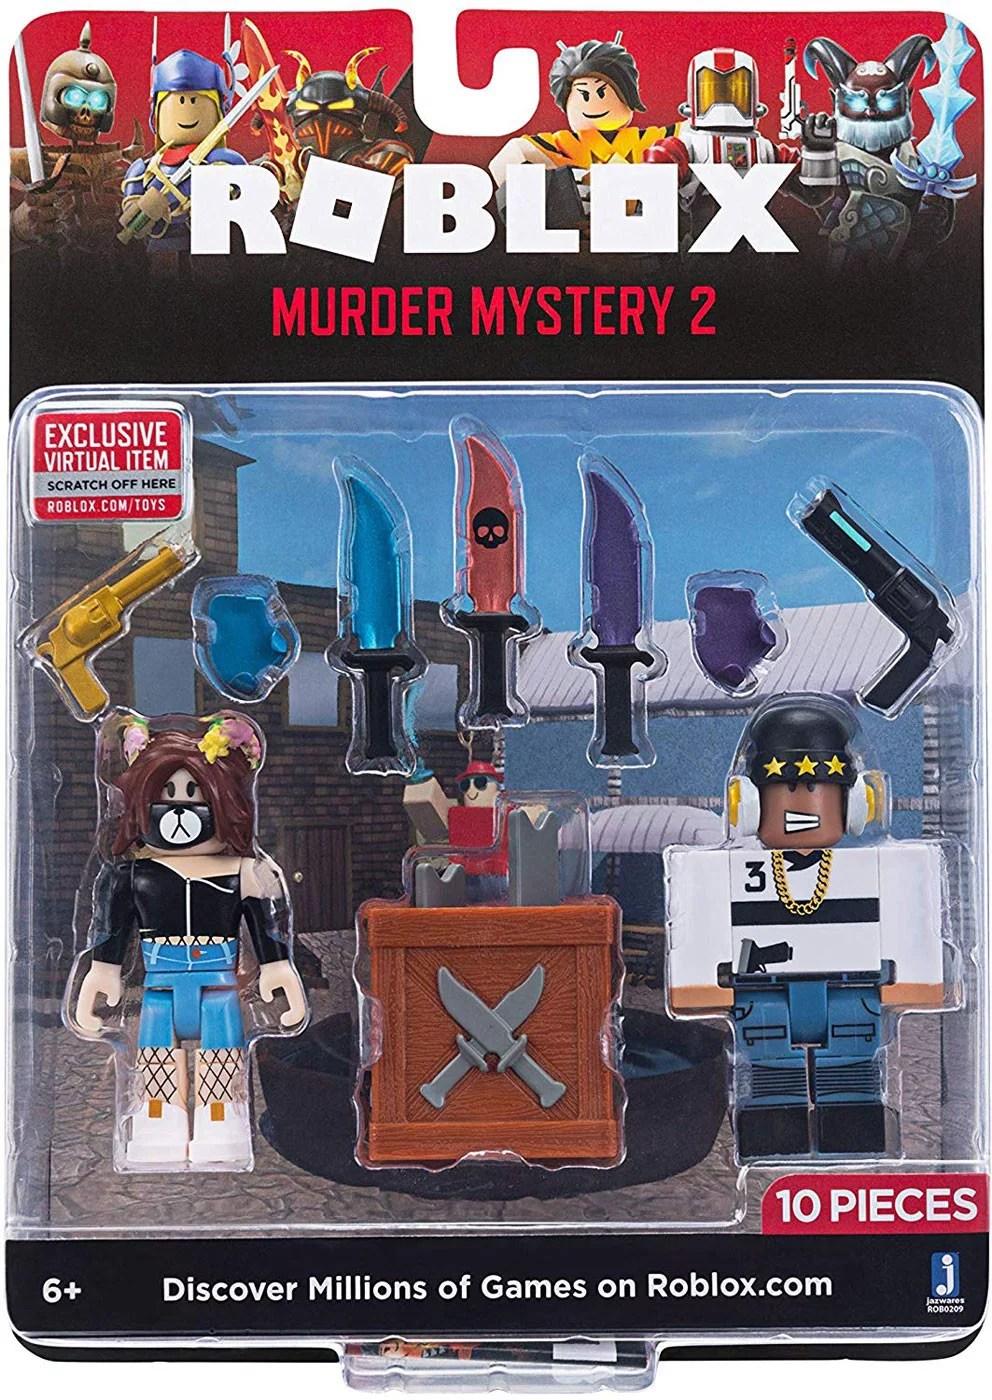 Roblox Www Toys Com : roblox, ROBLOX, Packs, Murder, Mystery, Walmart.com